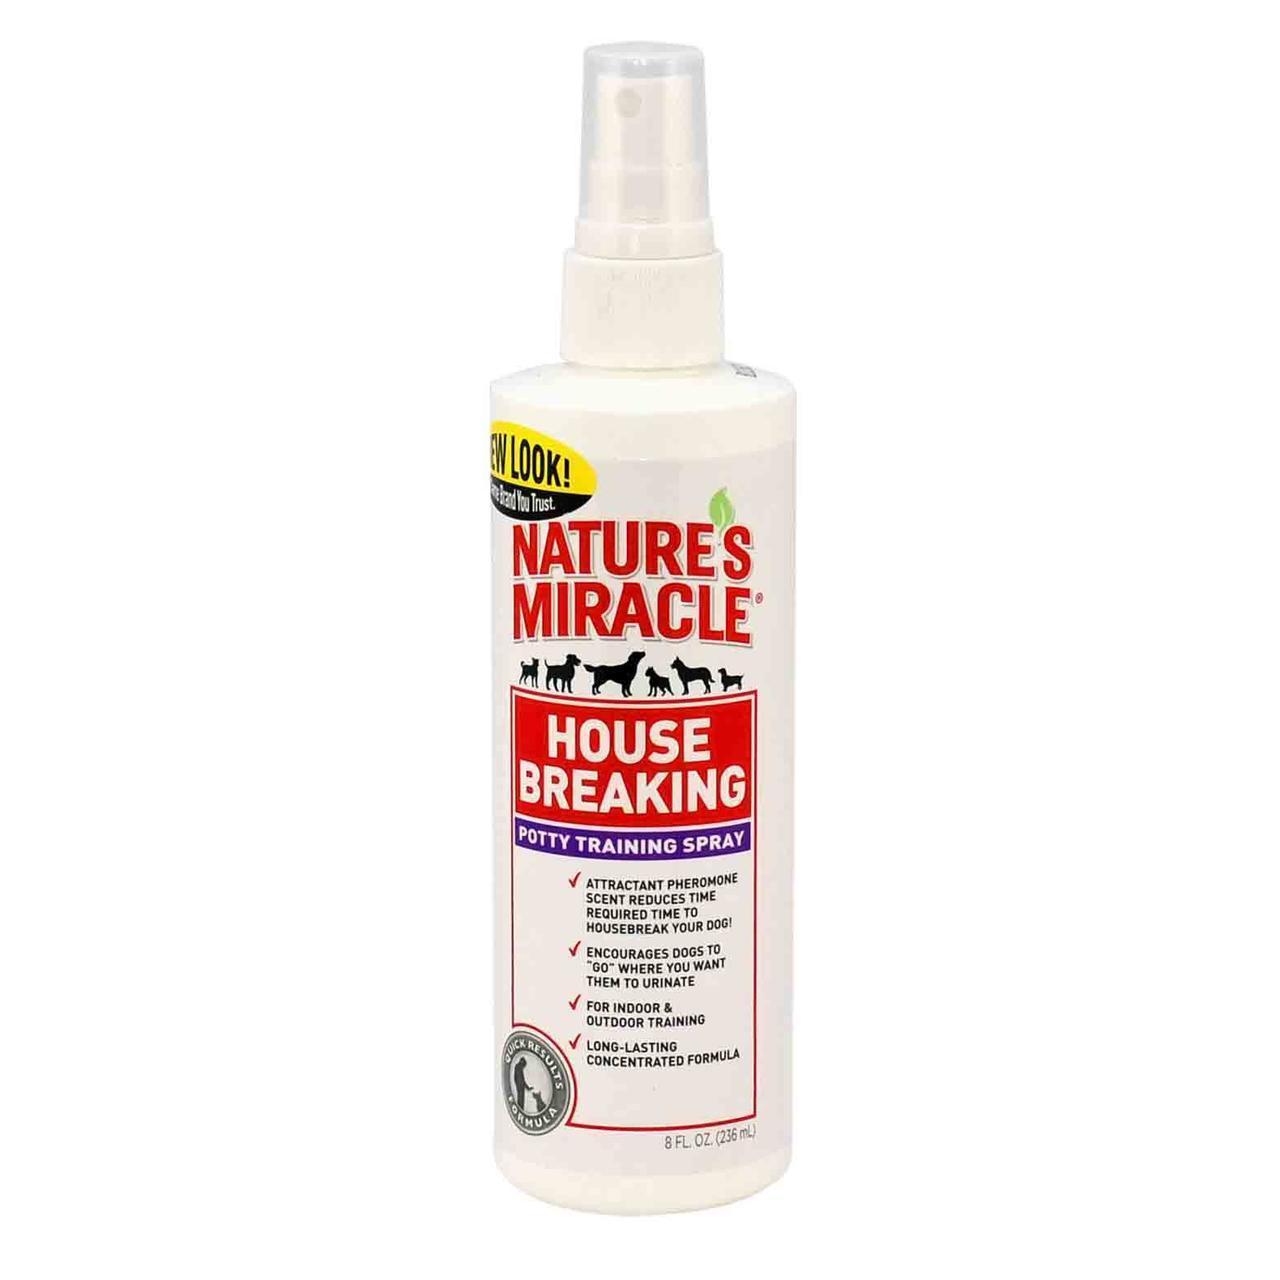 Спрей 8 in 1 nature's Miracle House Breaking для привчання щеняти до туалету, 237 мл